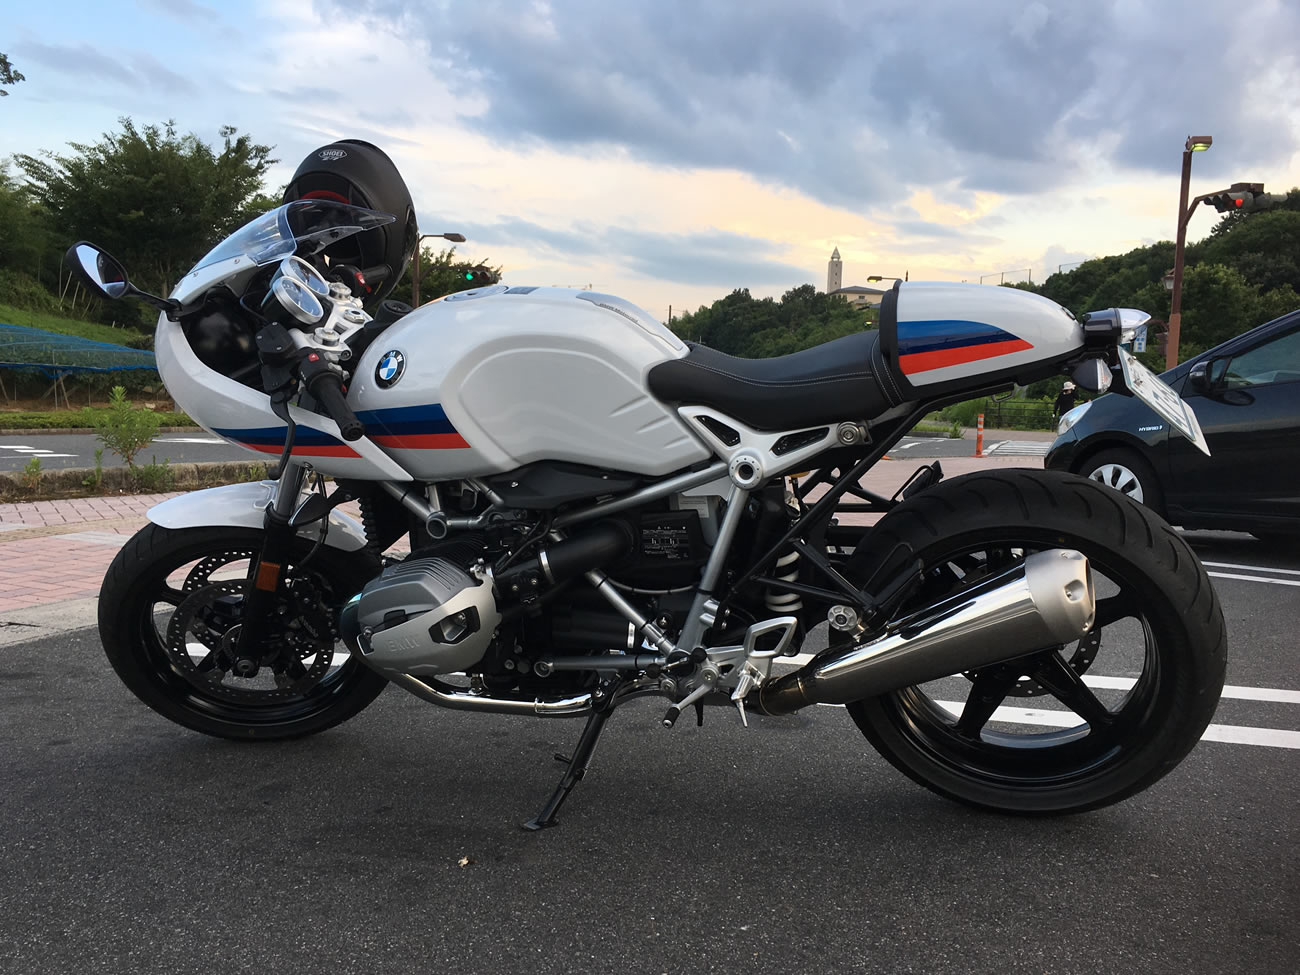 R nineT racer(BMWのカフェレーサー )ってどんなバイク?